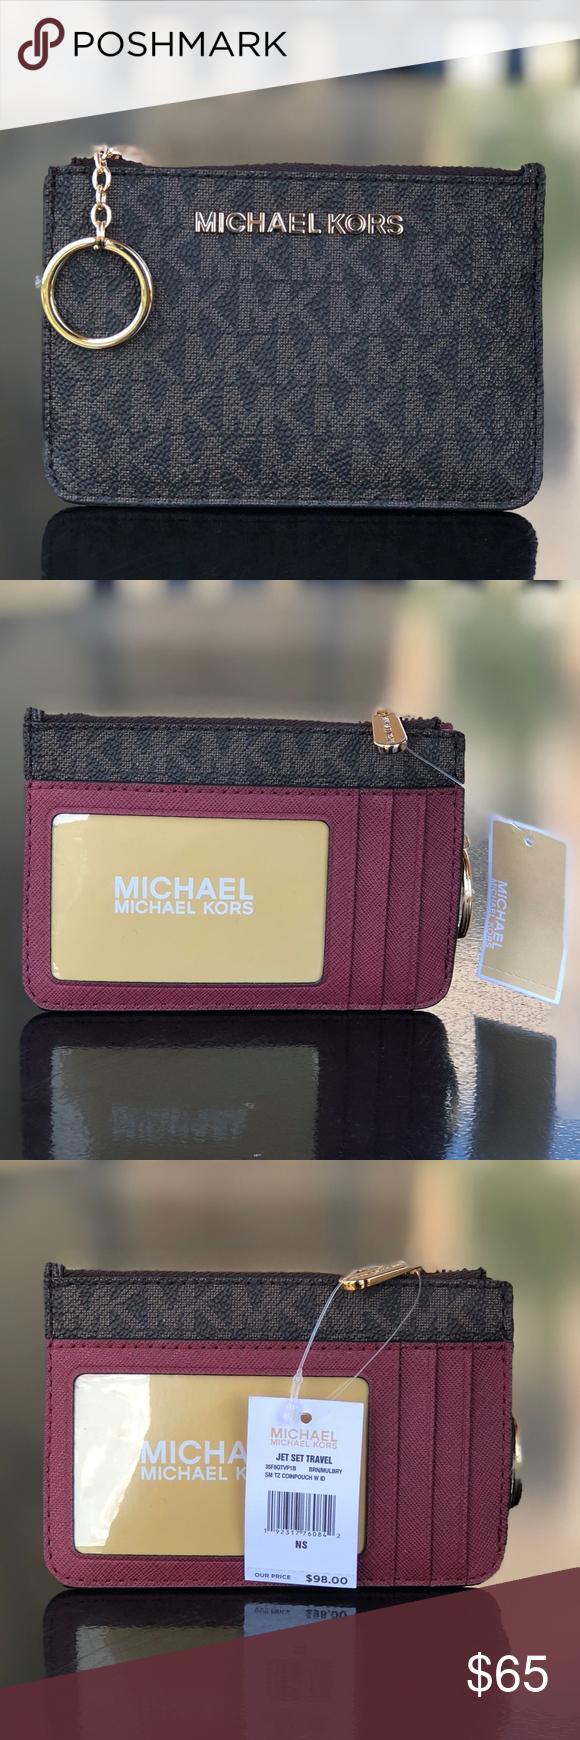 6ec3018b5a619 Michael Kors Jet Set Coin Pouch ID Key Brn MULBRY Authentic